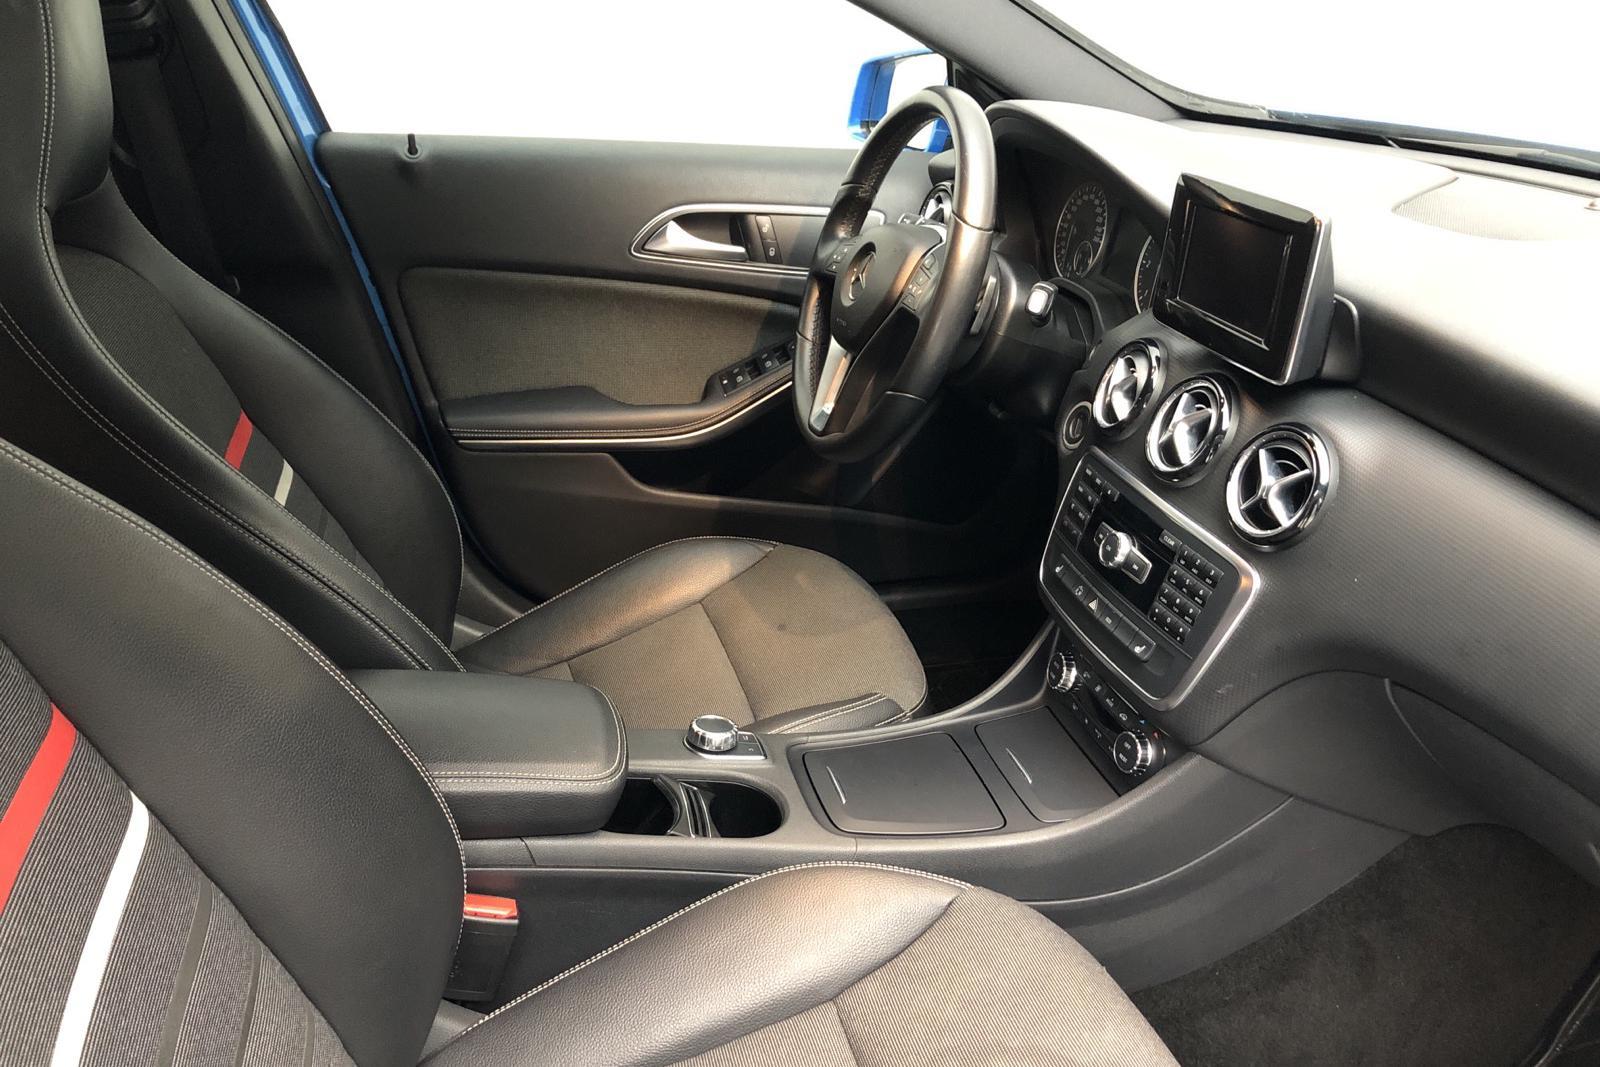 Mercedes A 180 CDI 5dr W176 (109hk) - 0 km - Dark Blue - 2013